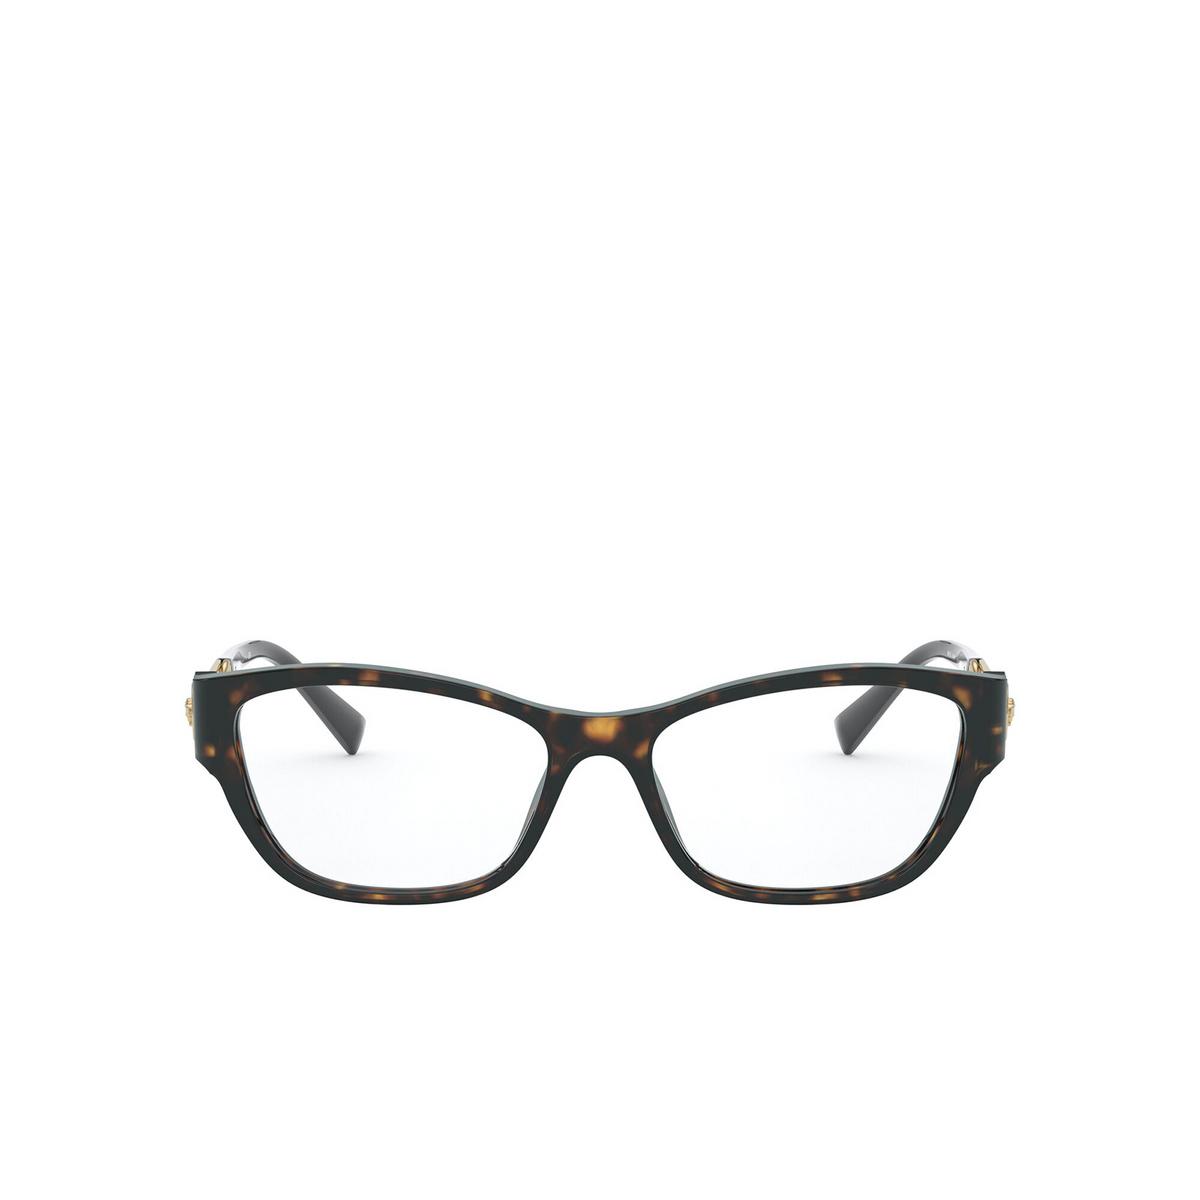 Versace® Cat-eye Eyeglasses: VE3288 color Havana 108 - front view.